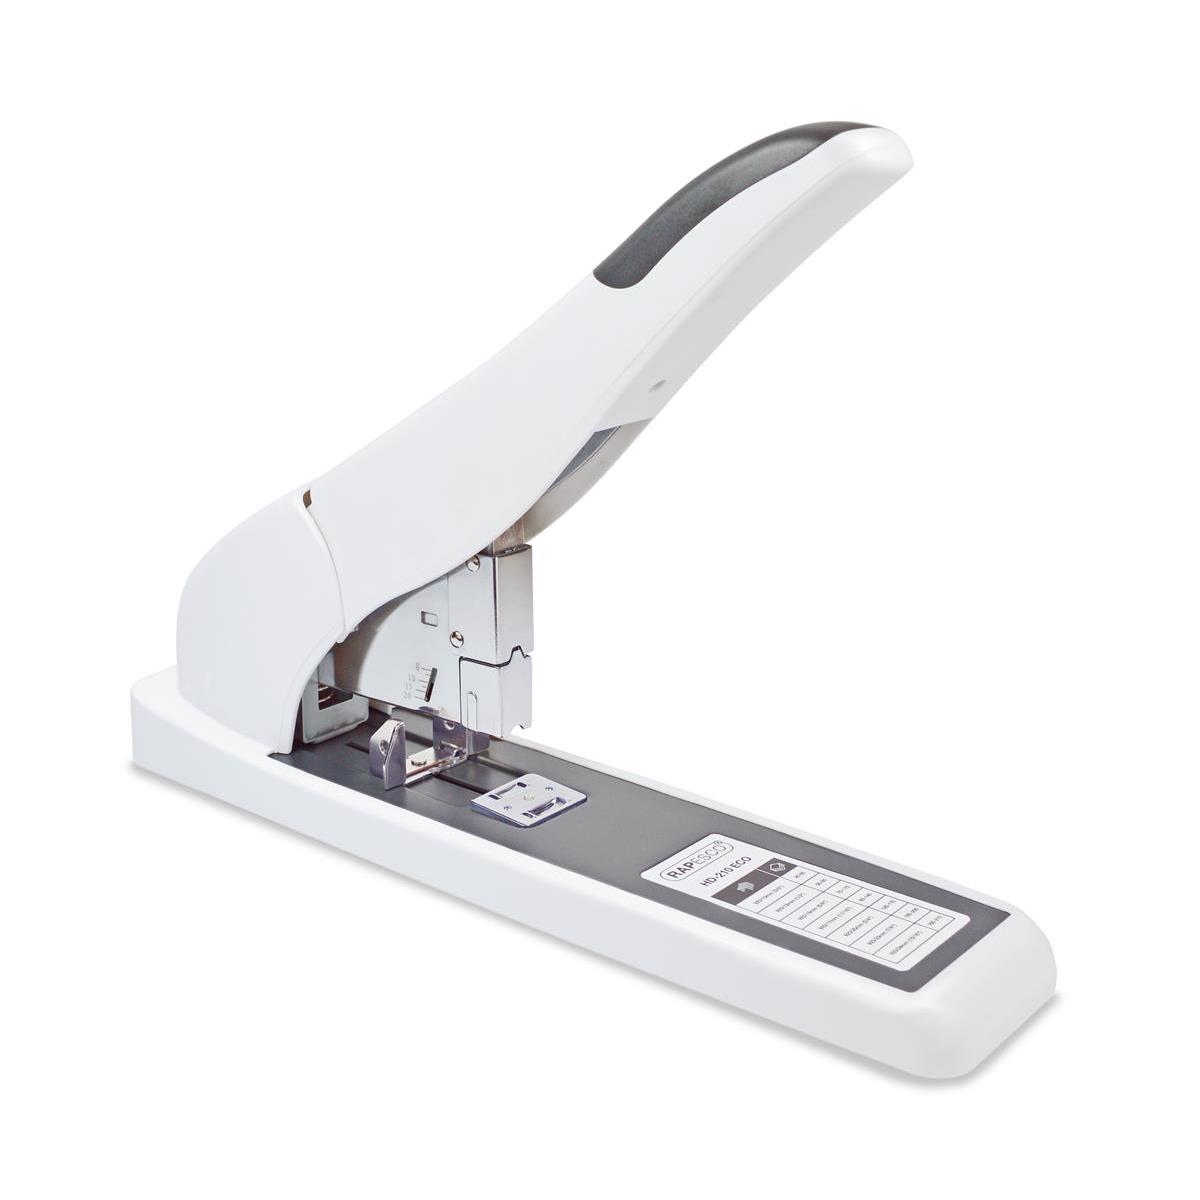 Rapesco ECO 210 Heavy Duty Full Strip Stapler Capacity 210 Sheets White Ref 1397